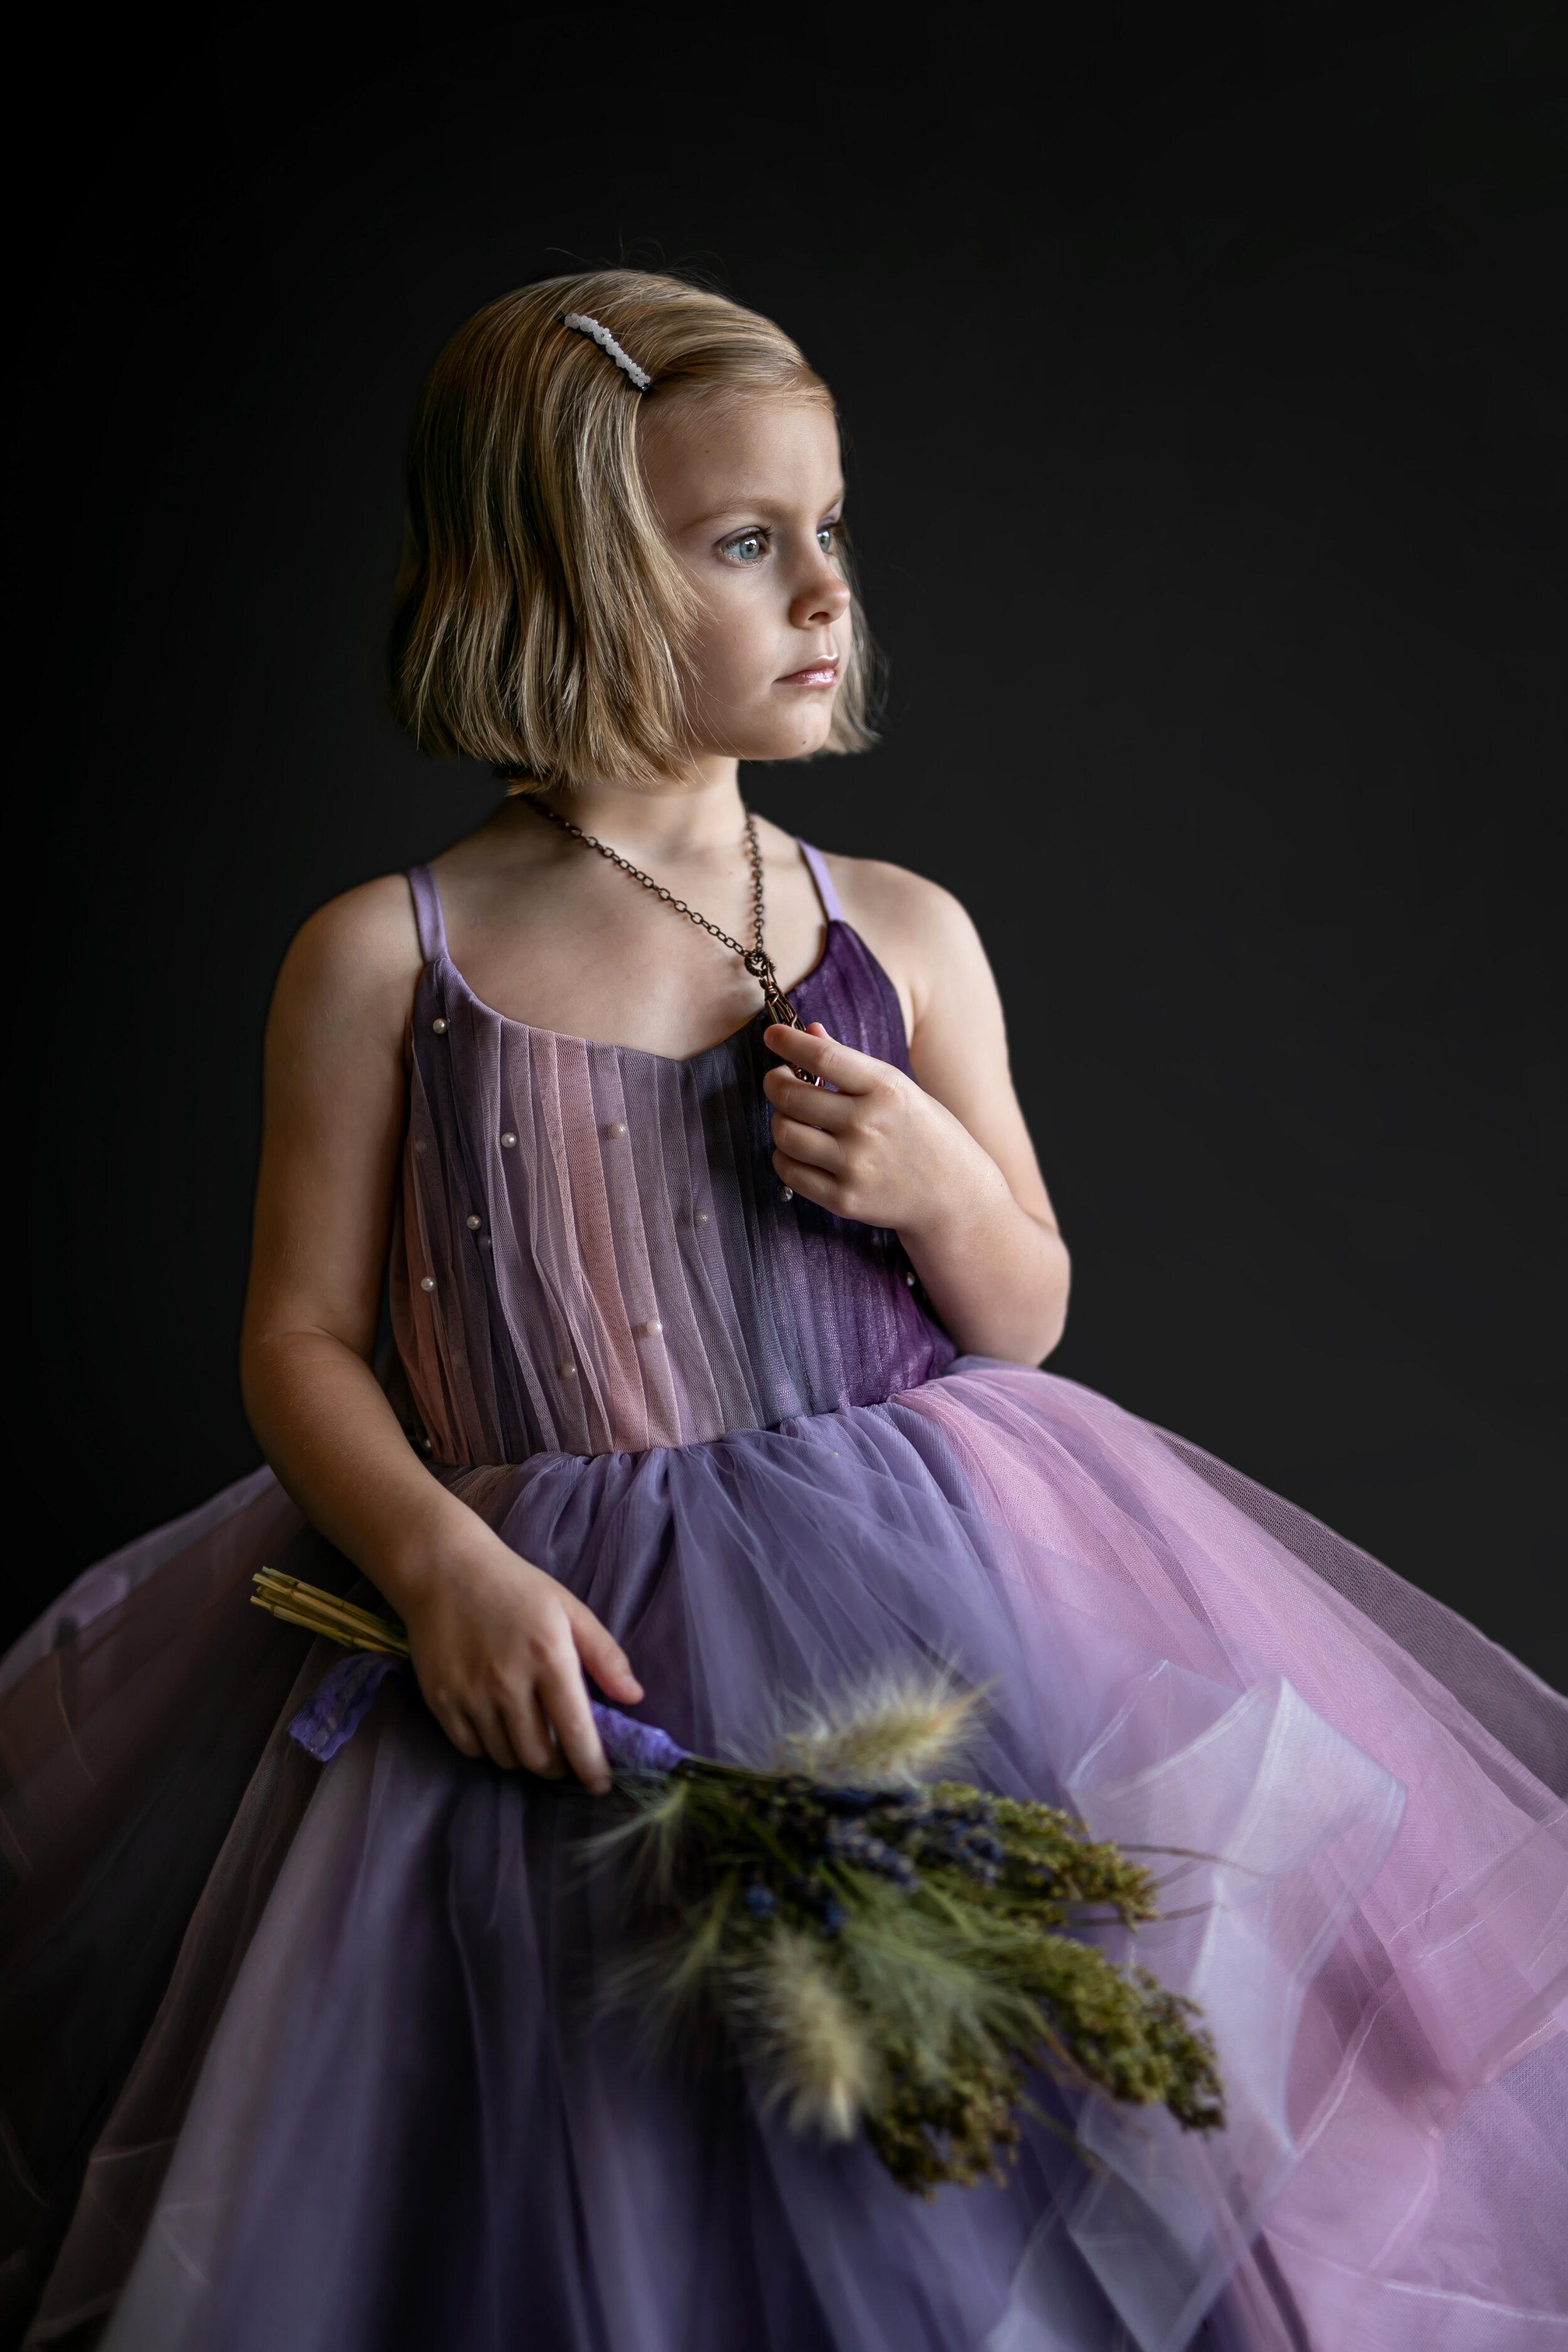 chicago illinois lake county illinois couture child-9041.jpg